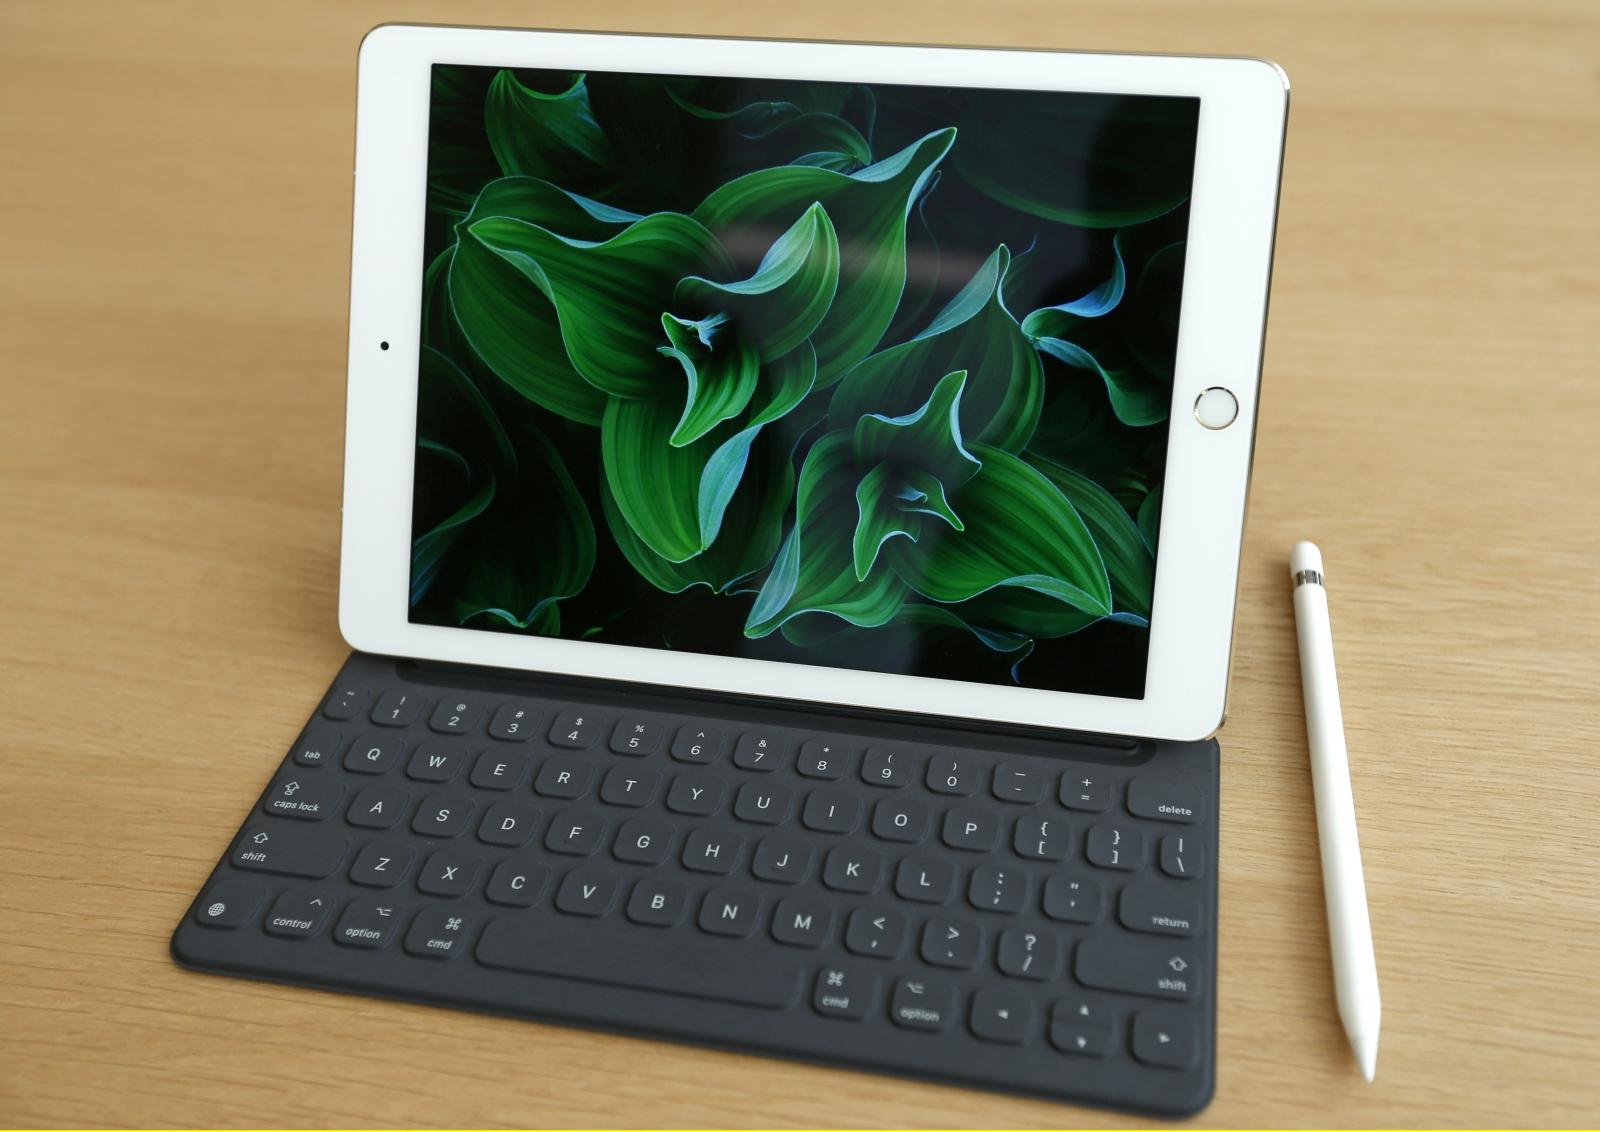 Apple iPad Pro with Apple Pencil